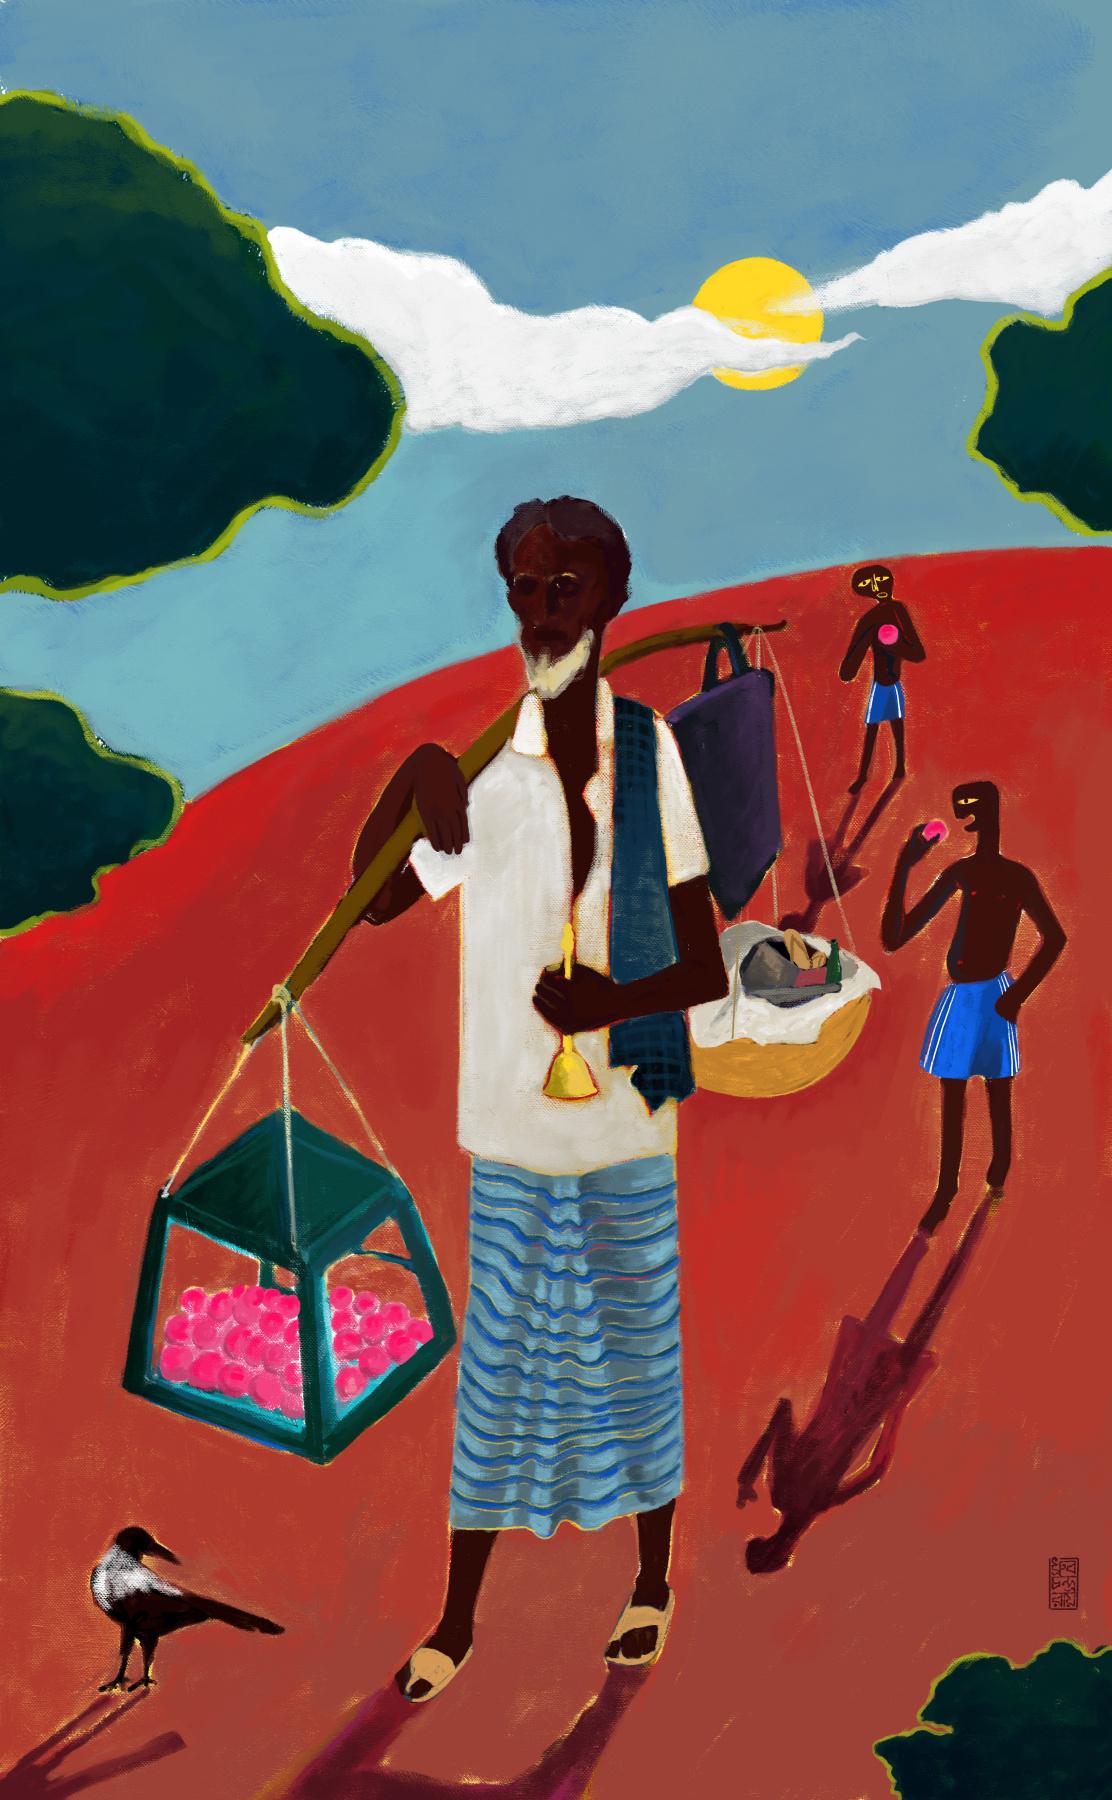 Dhruba Badhan. Cottoncandy seller